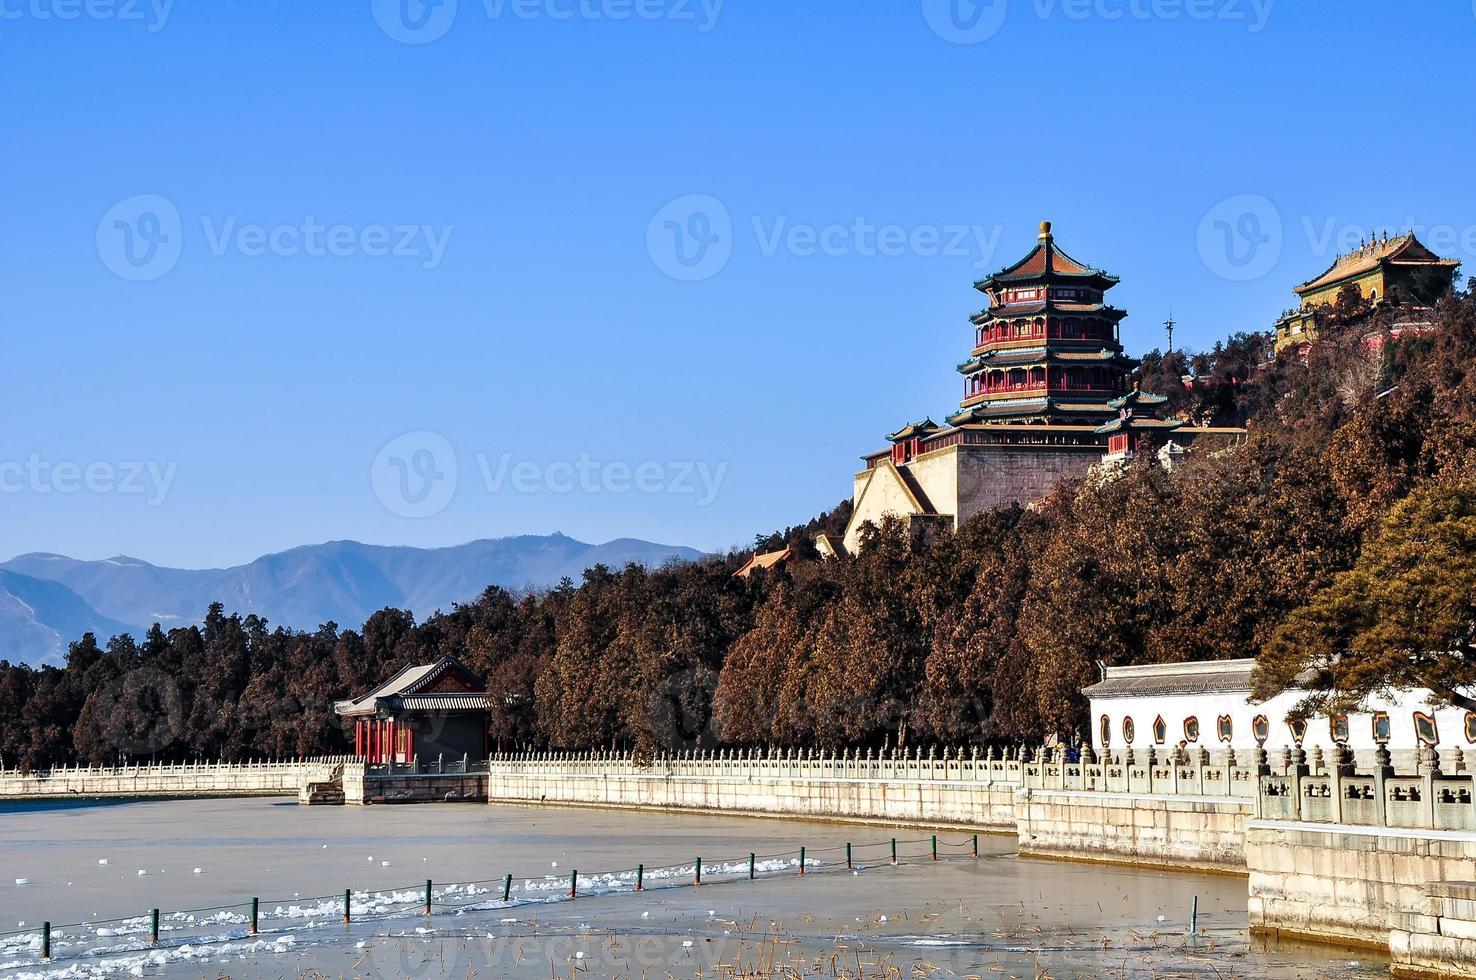 giardino reale di Pechino foto